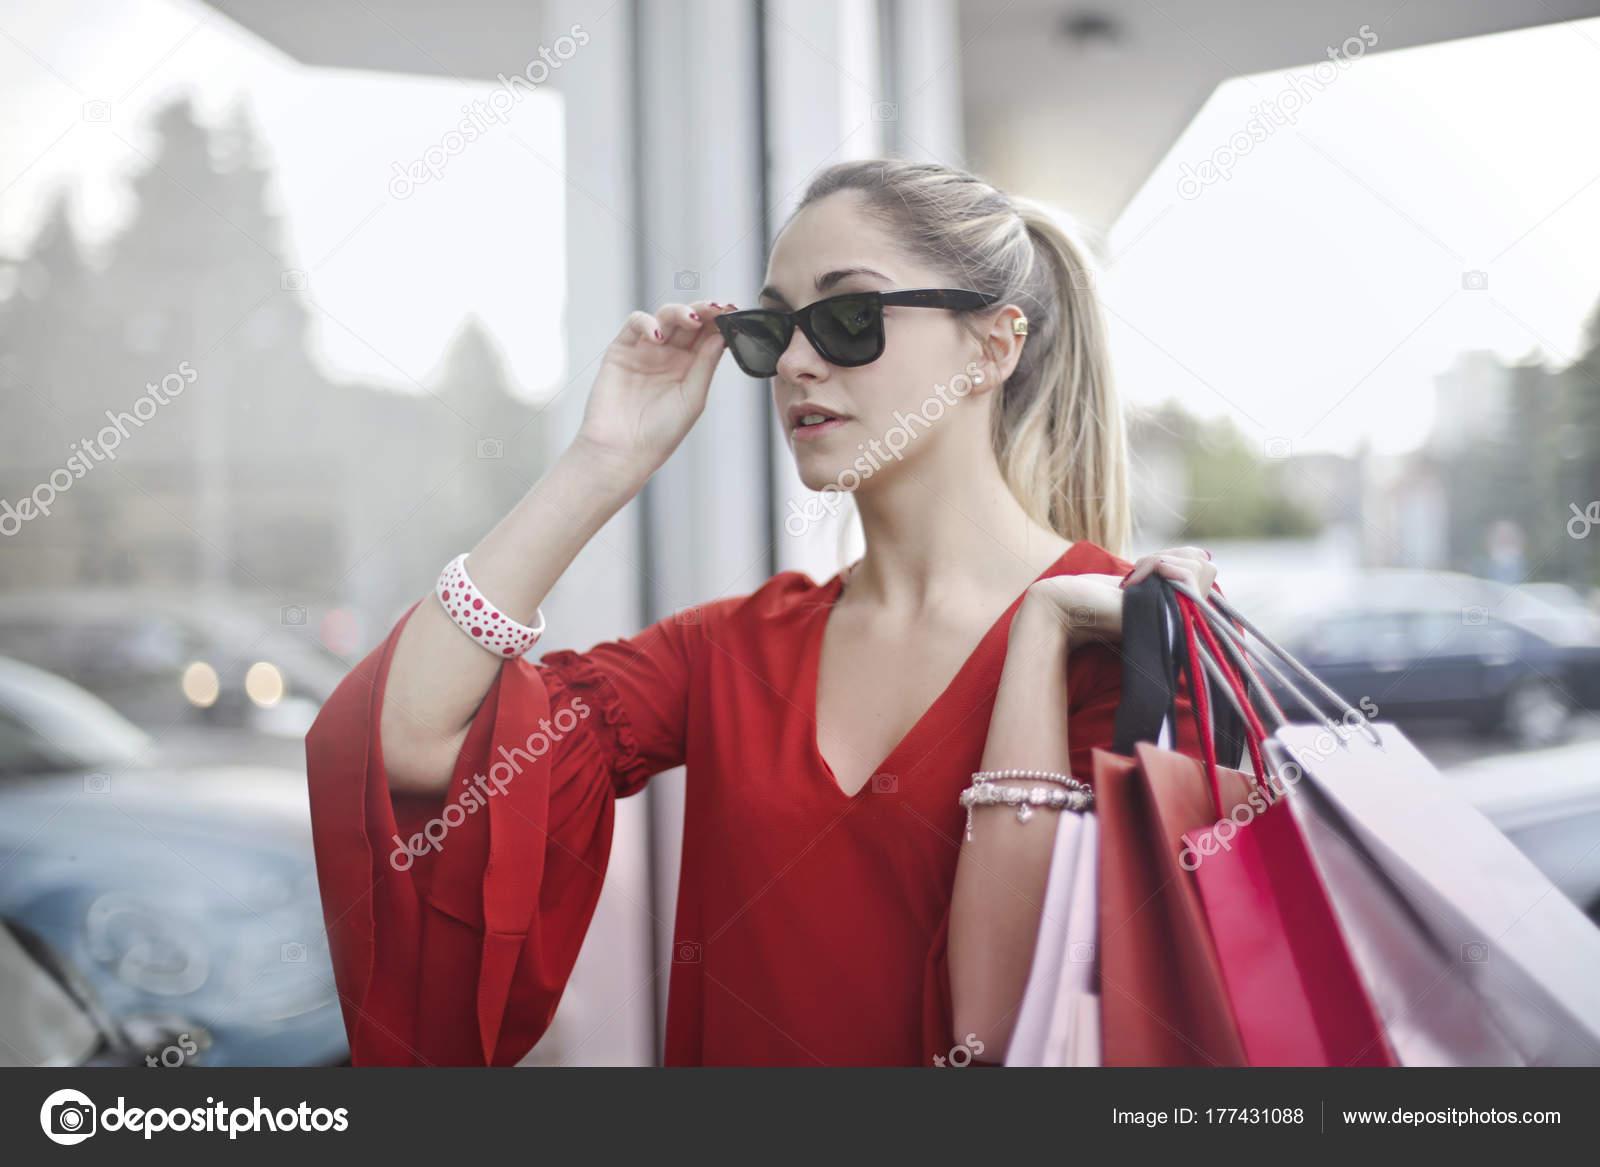 7f2f108059 Ξανθιά Νεαρή Γυναίκα Γυαλιά Ηλίου Που Κατέχουν Πολλές Τσάντες Για — Φωτογραφία  Αρχείου